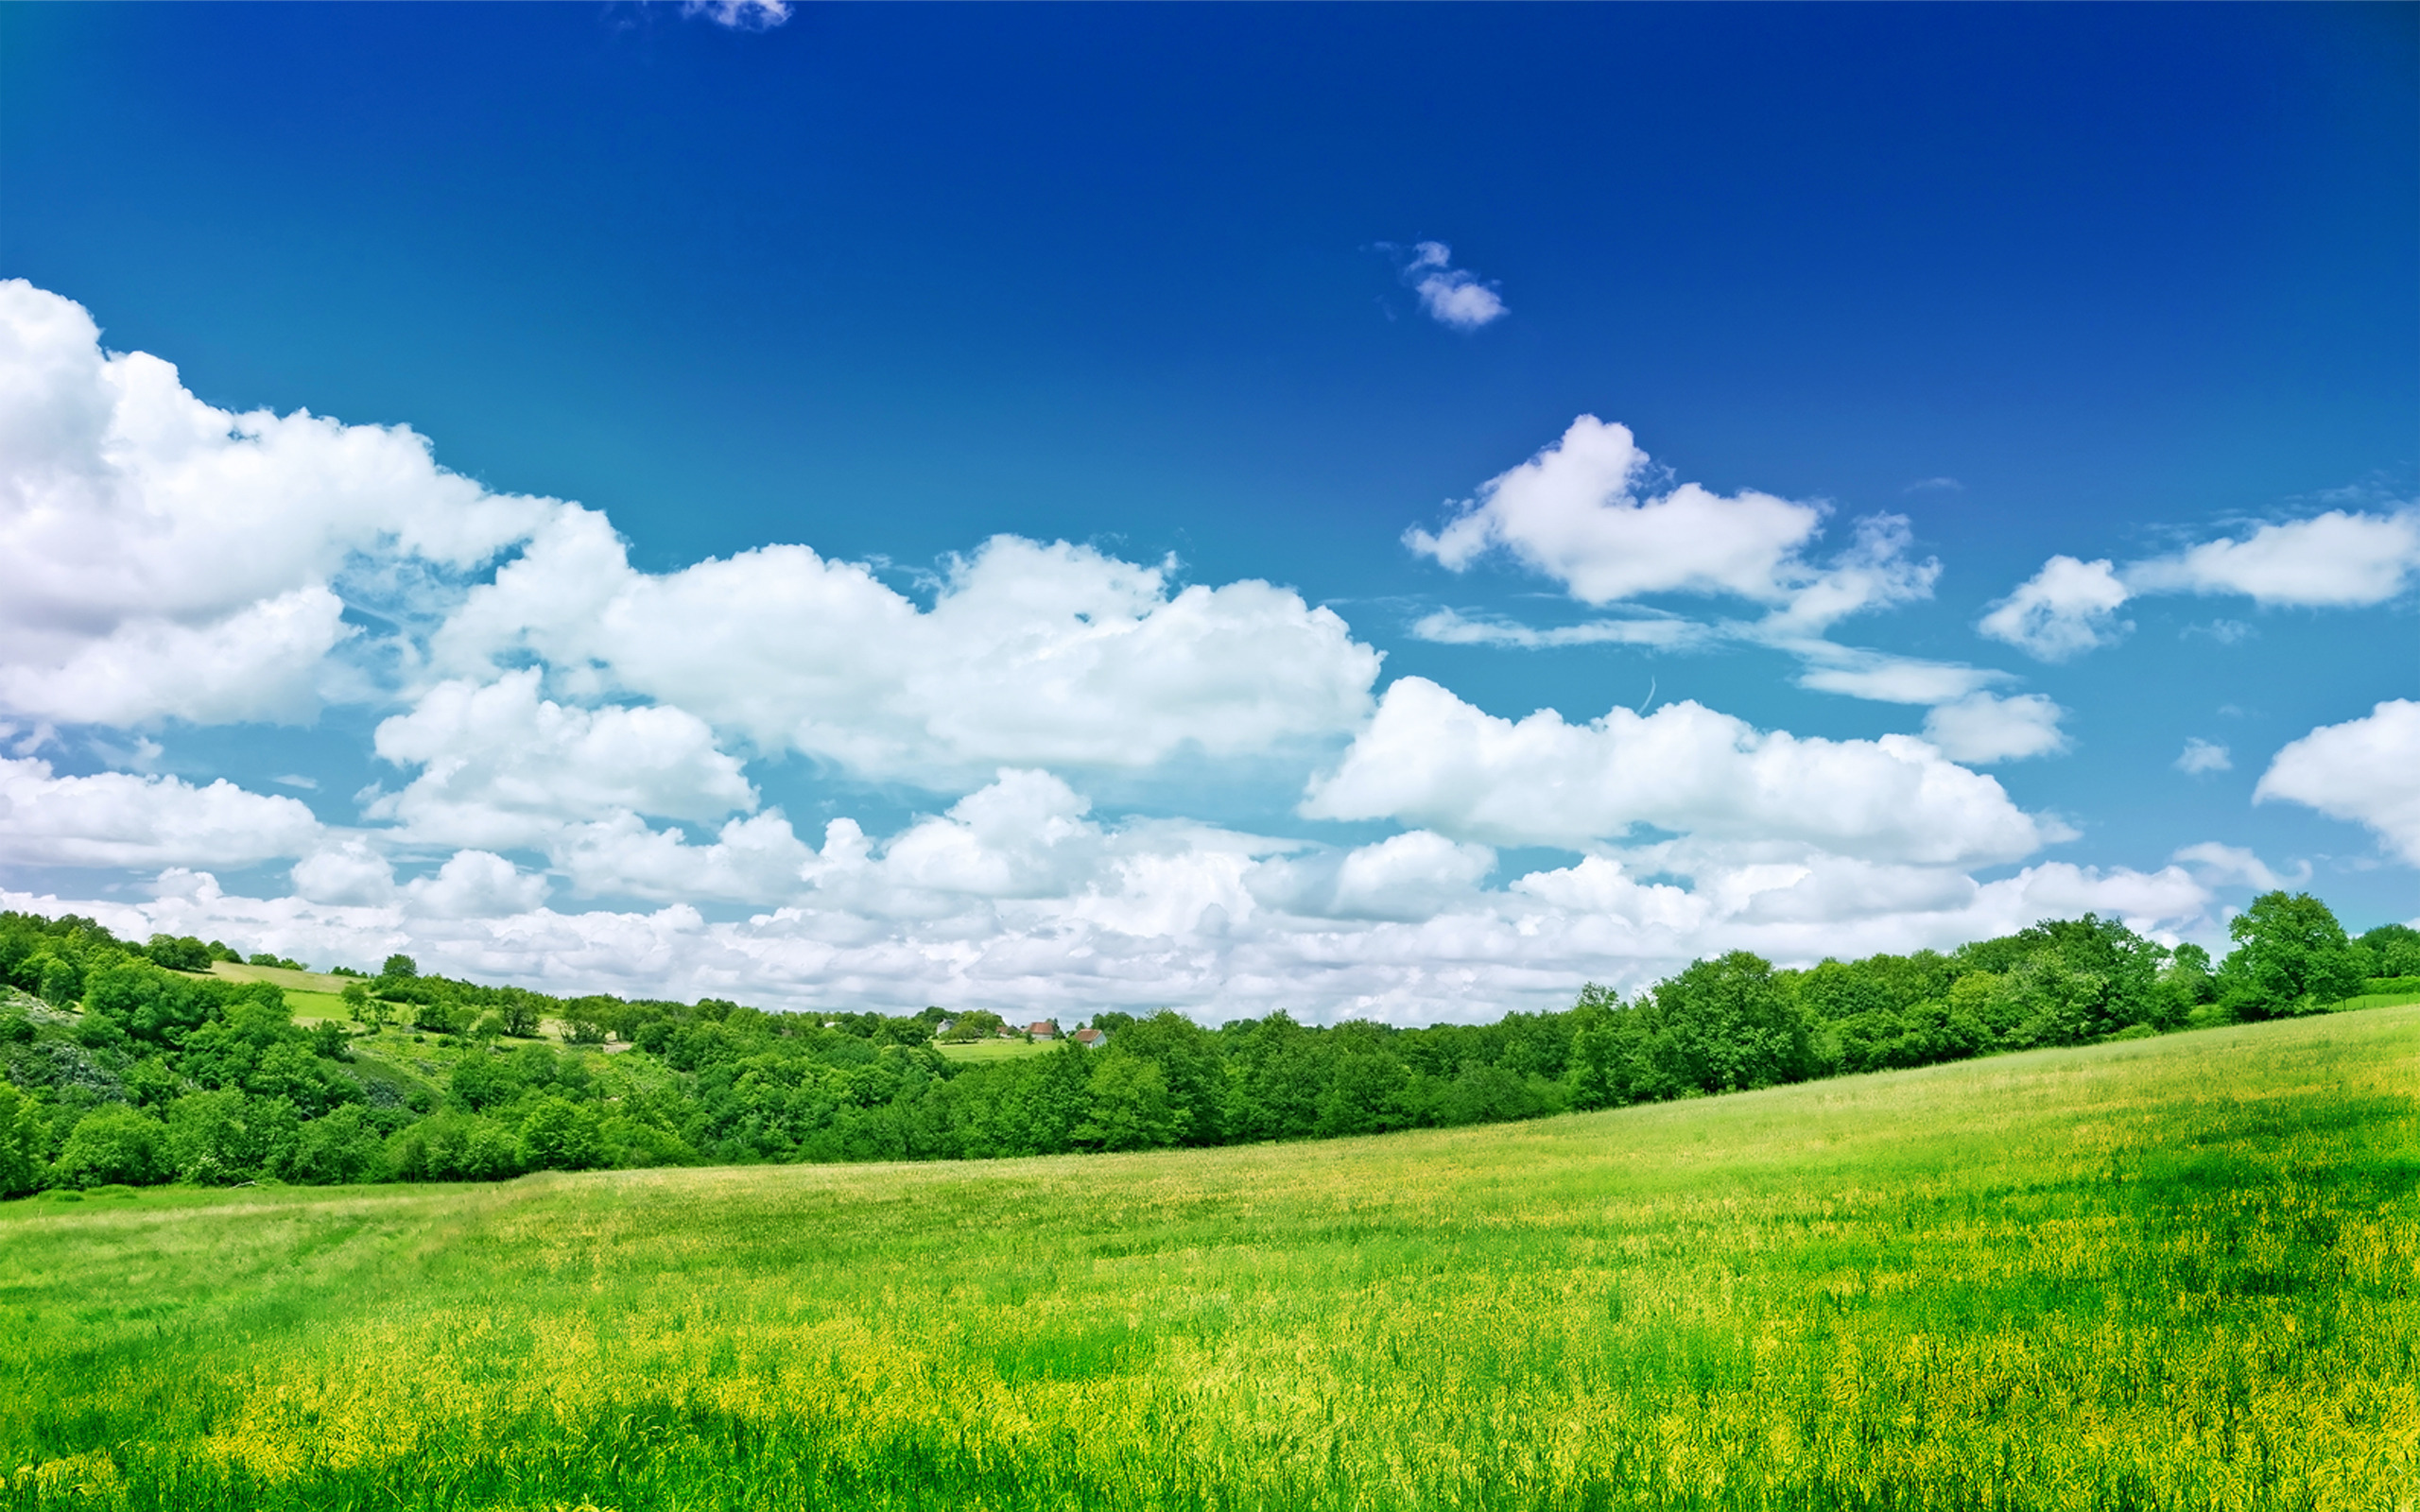 Field Nature Sky